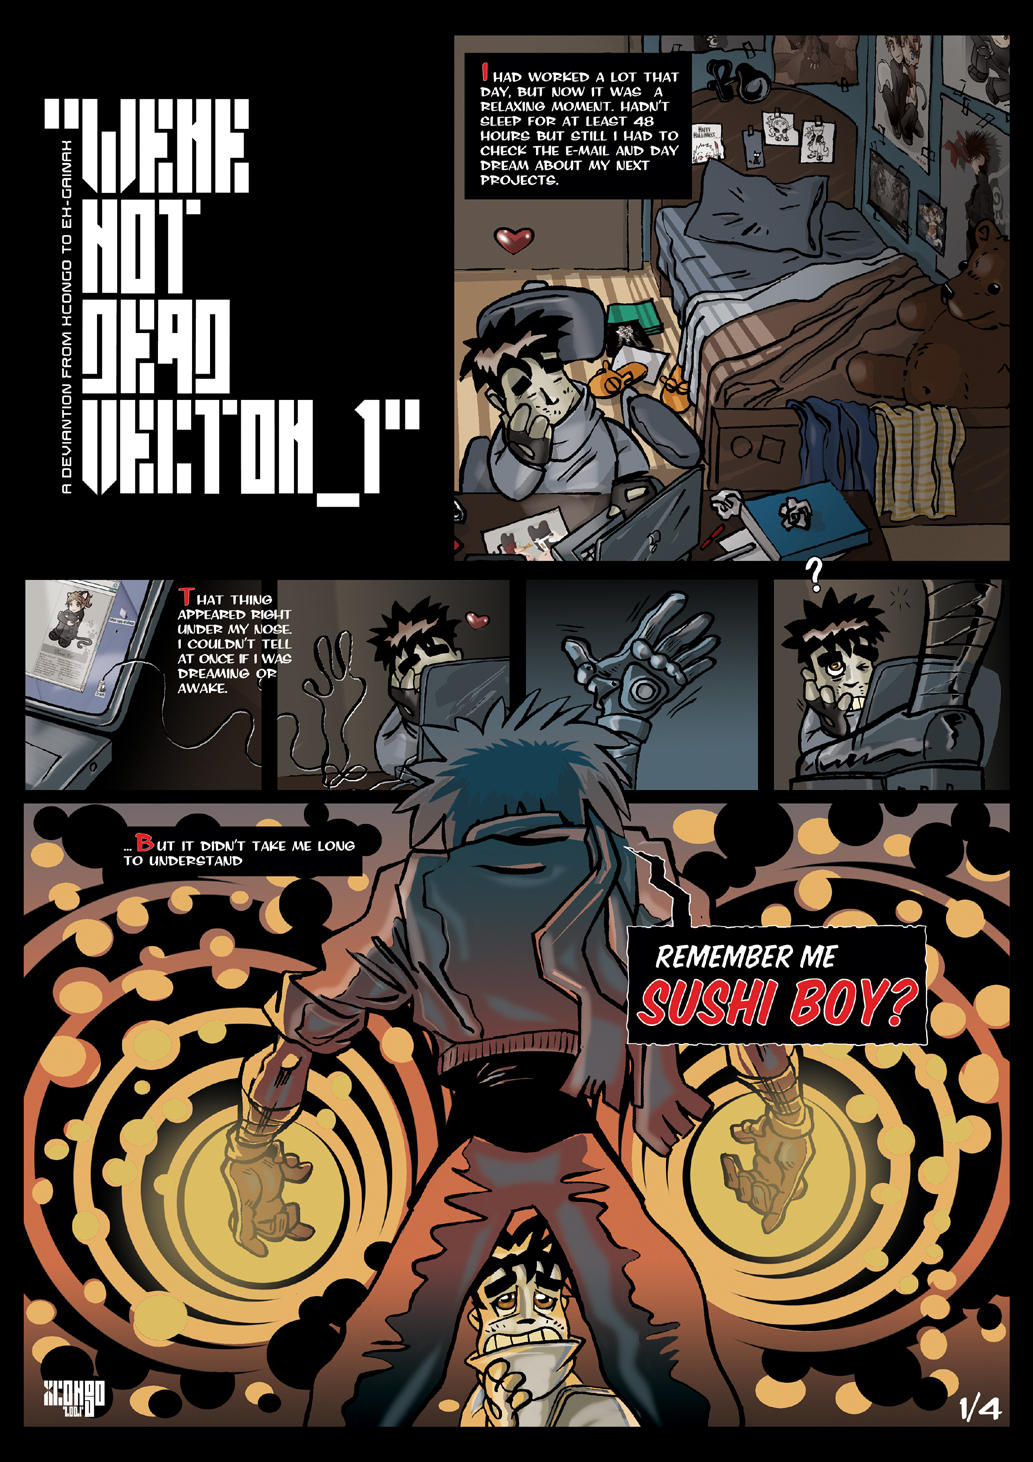 'Were not dead Vector_1' by xcongo